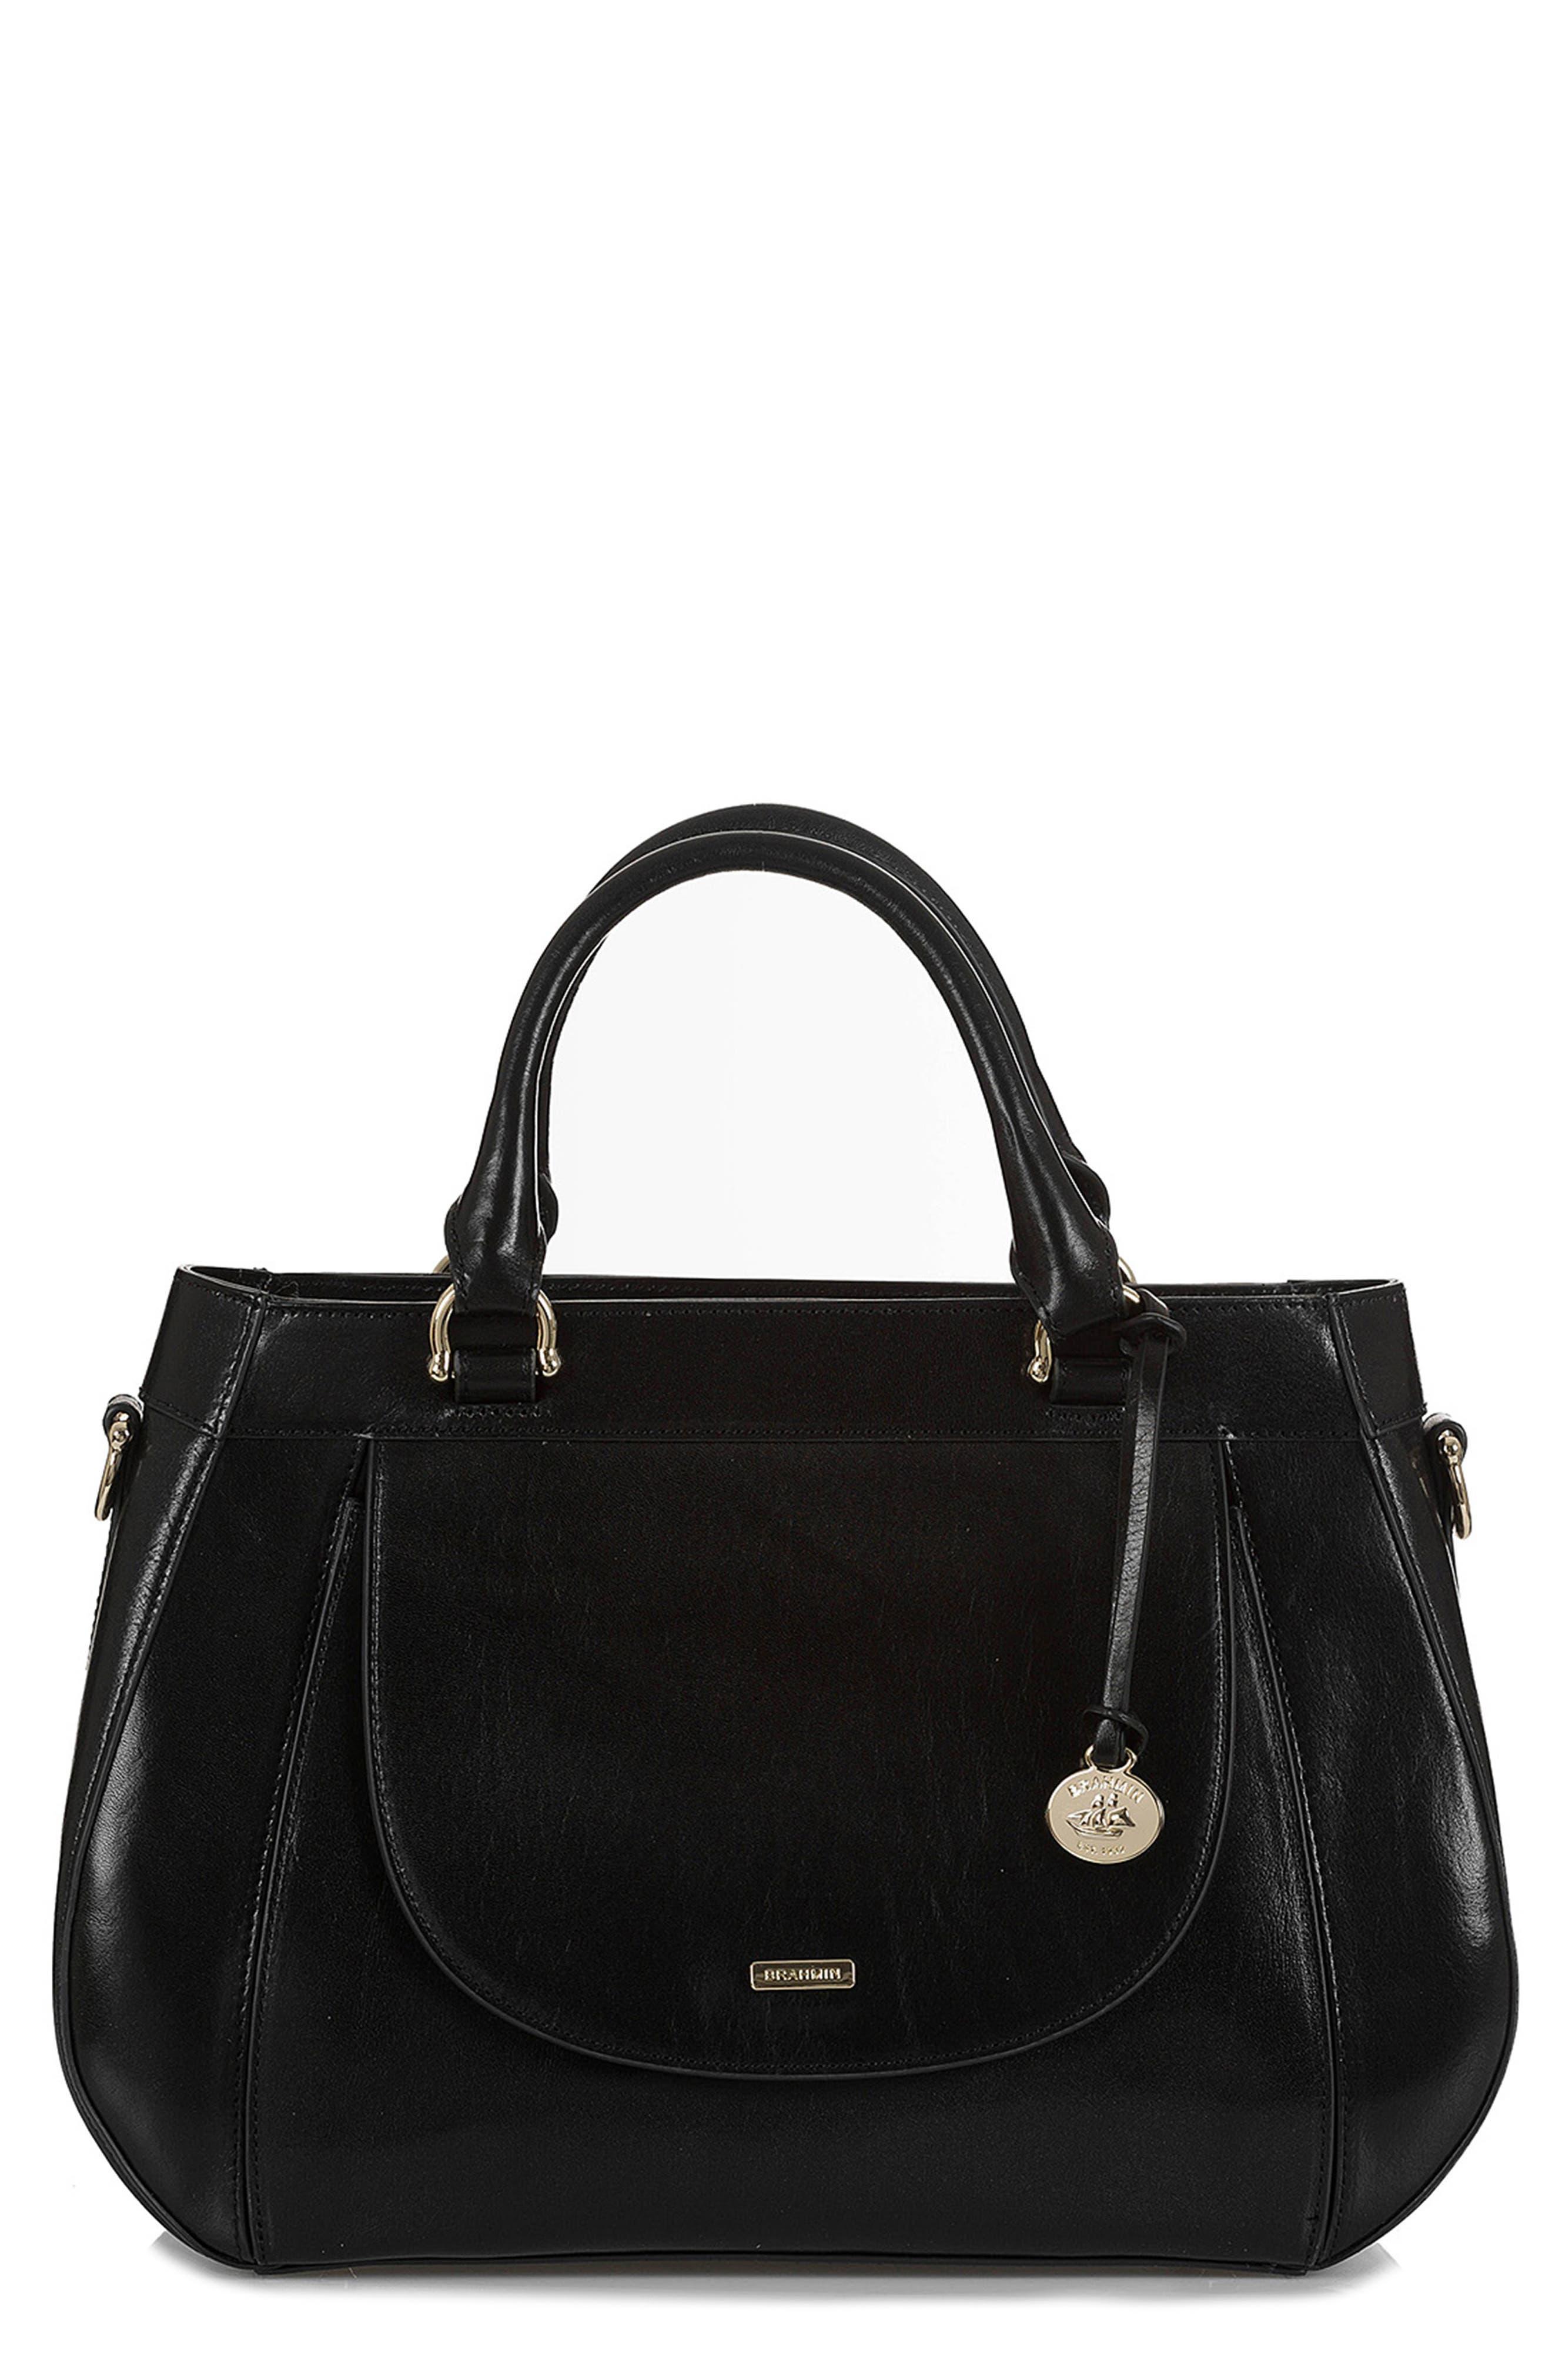 Raelynn Leather Satchel,                             Main thumbnail 1, color,                             BLACK